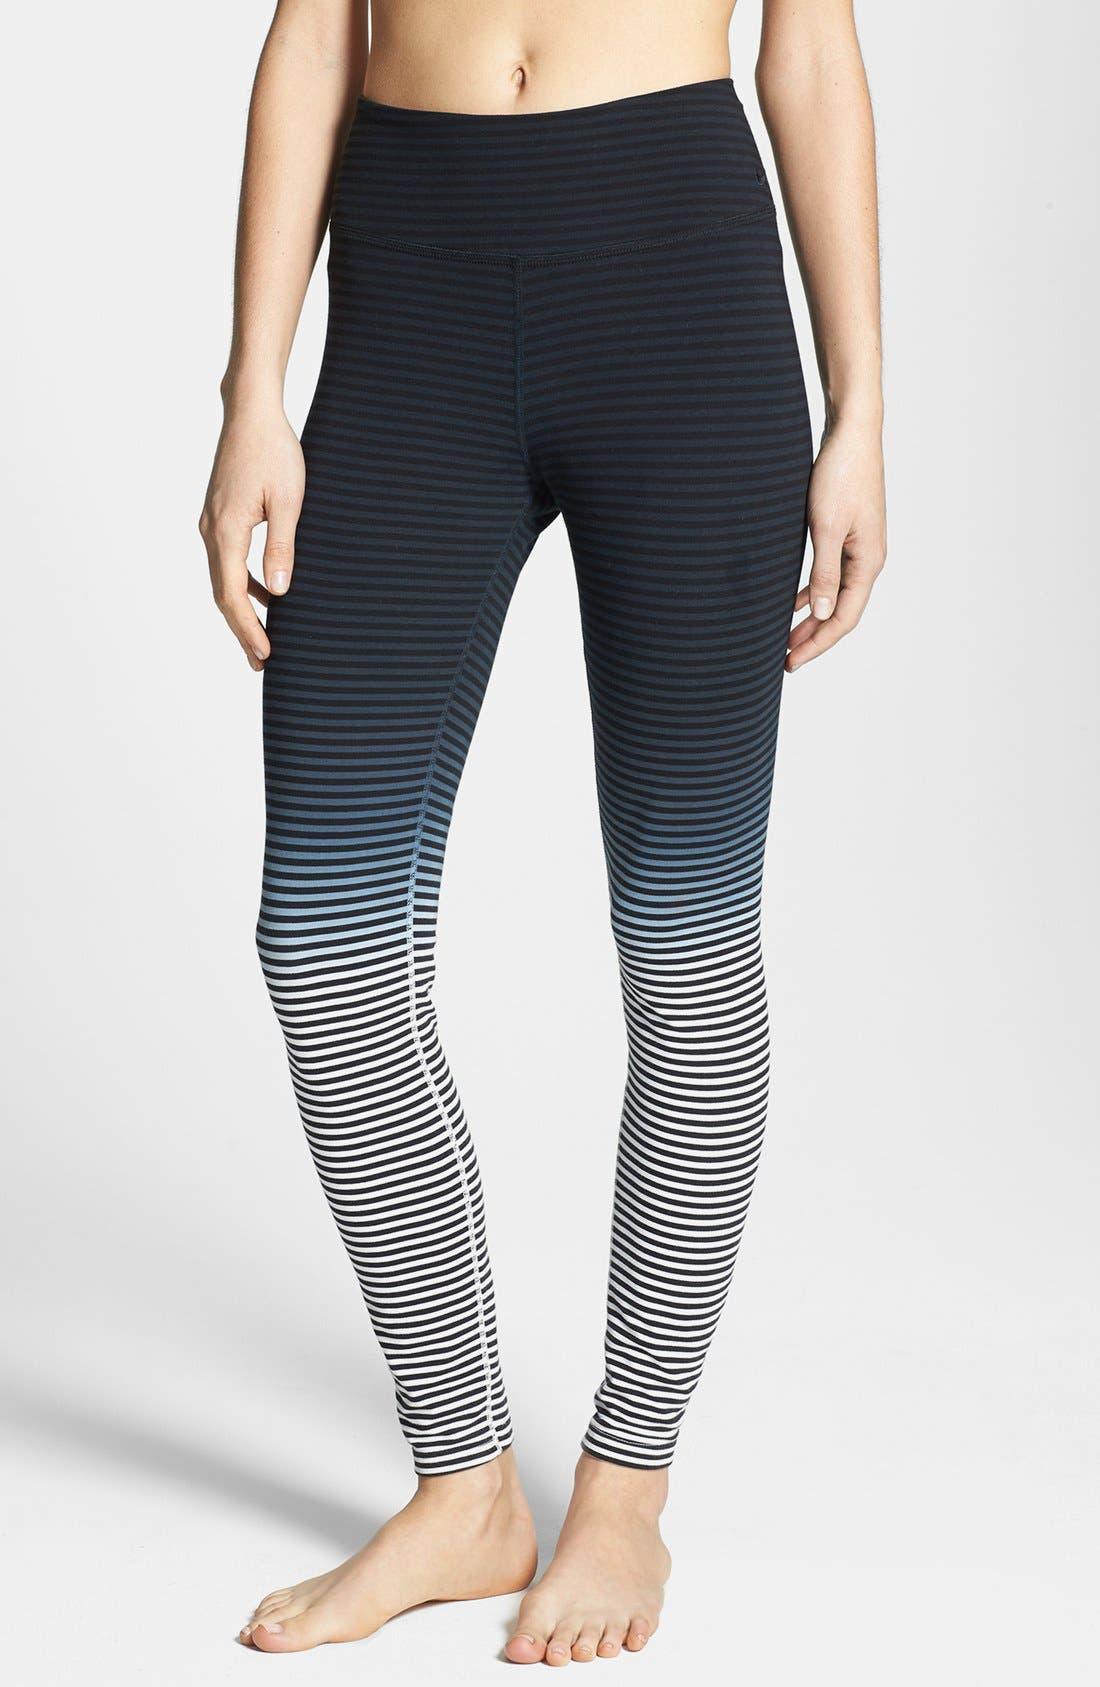 Alternate Image 1 Selected - Nike 'Legend' Dri-FIT Print Tights